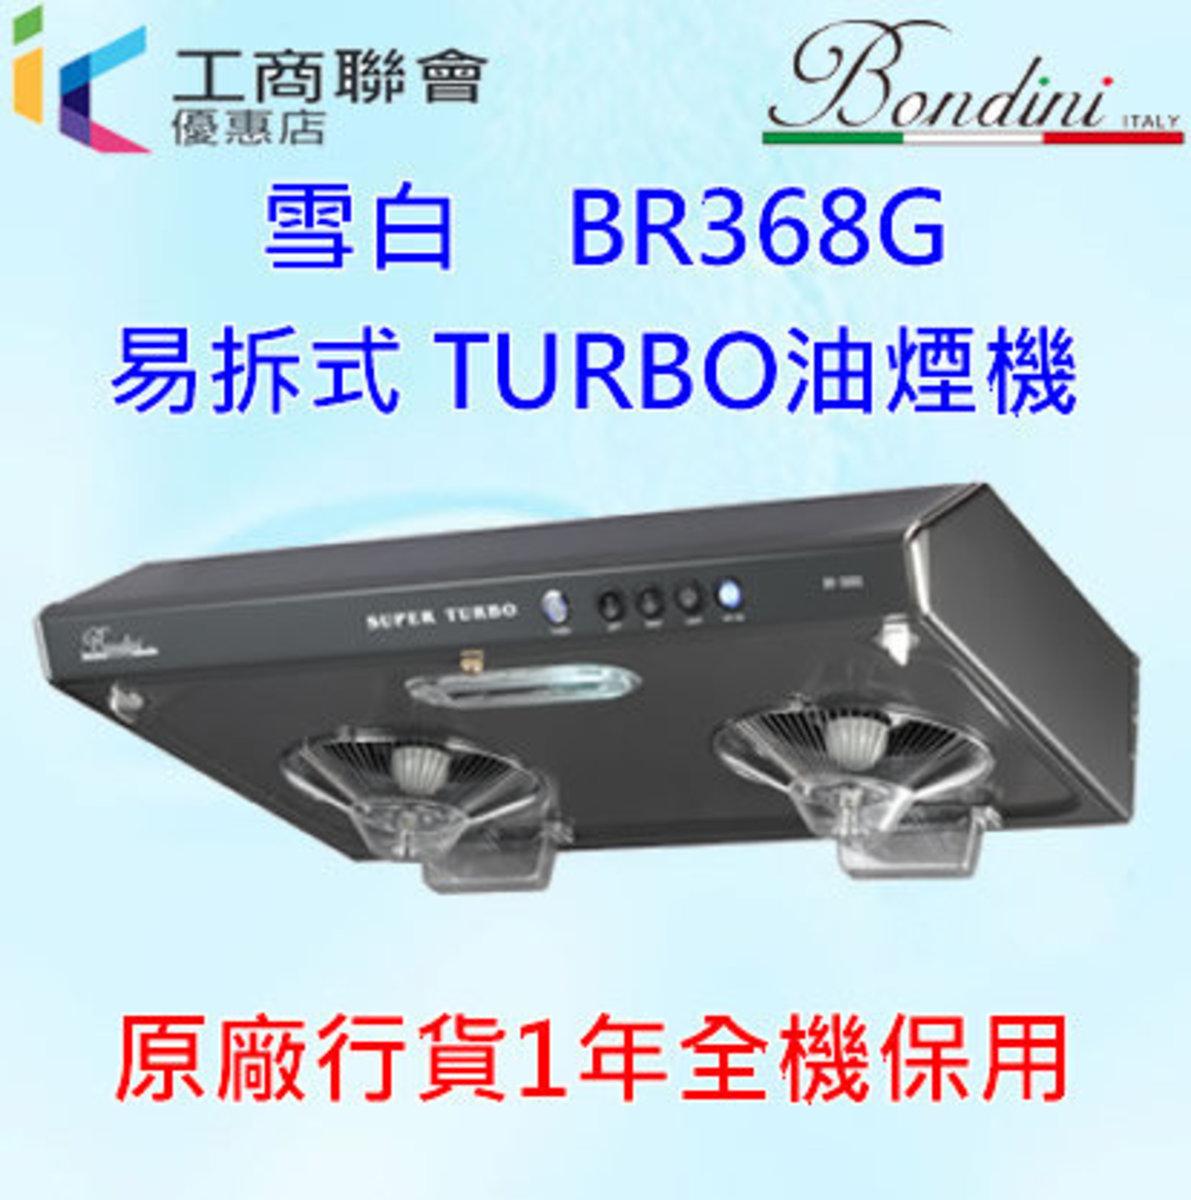 Bondini    BR368G 易拆式TURBO油煙機